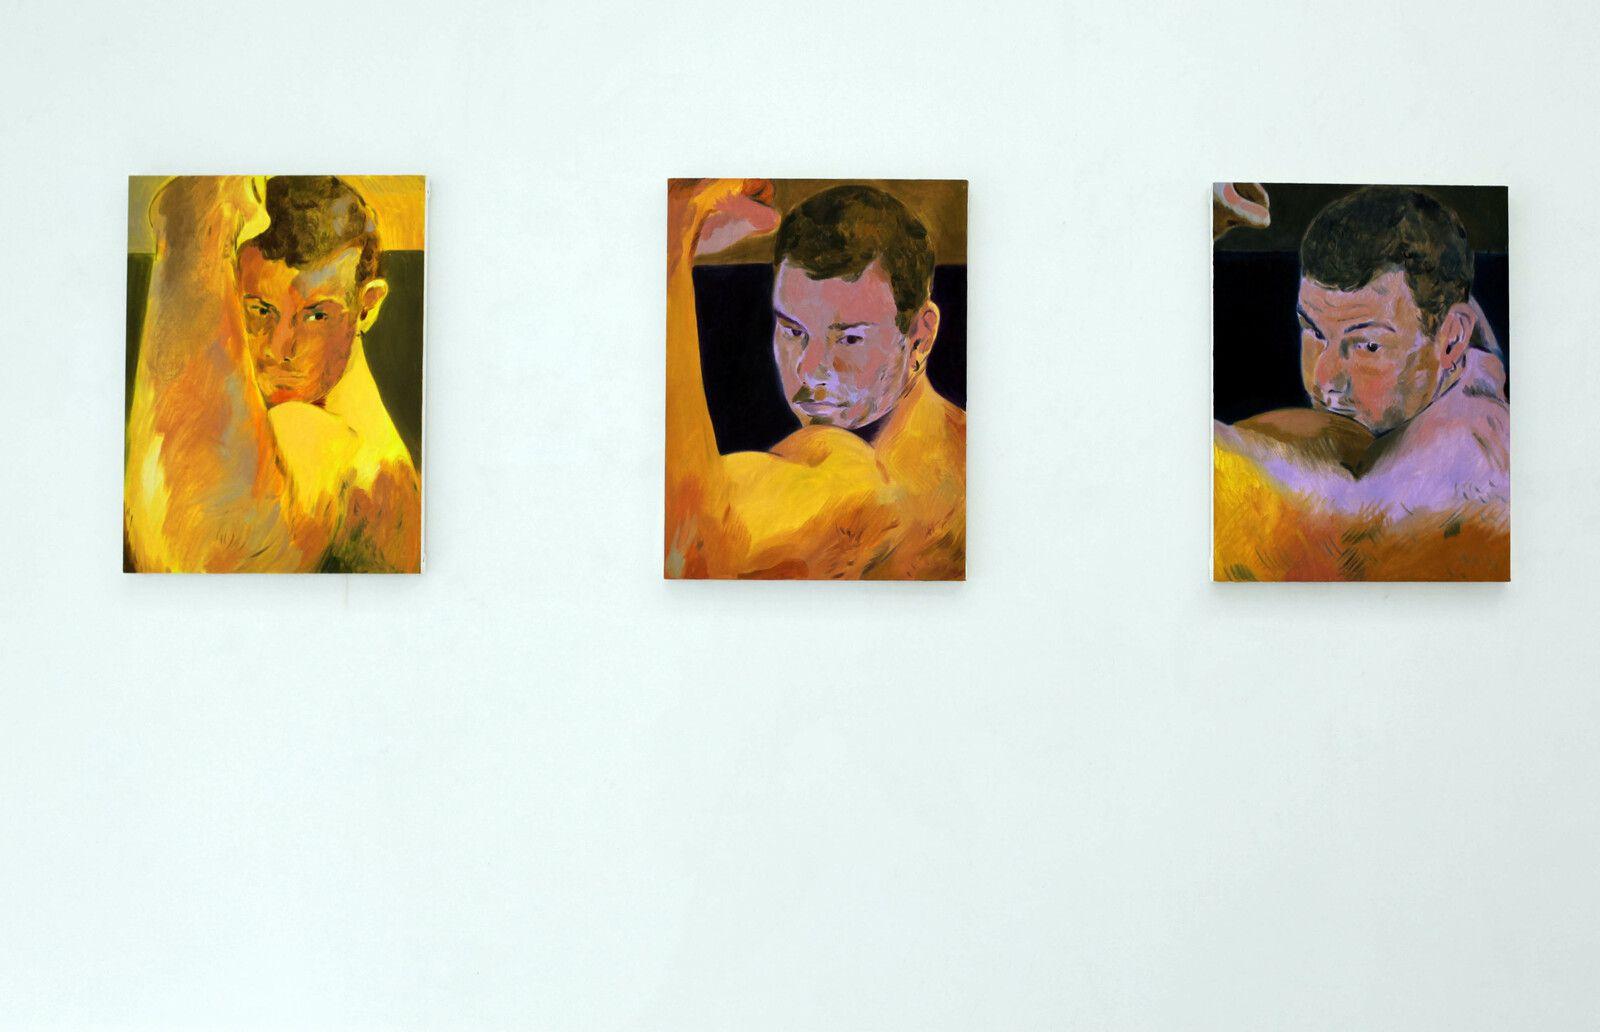 """Devirosflexing I, II, II"", 2020 de Anthony CUDAHY - Courtesy de l'artiste et de la Galerie Semiose © Photo Éric Simon"